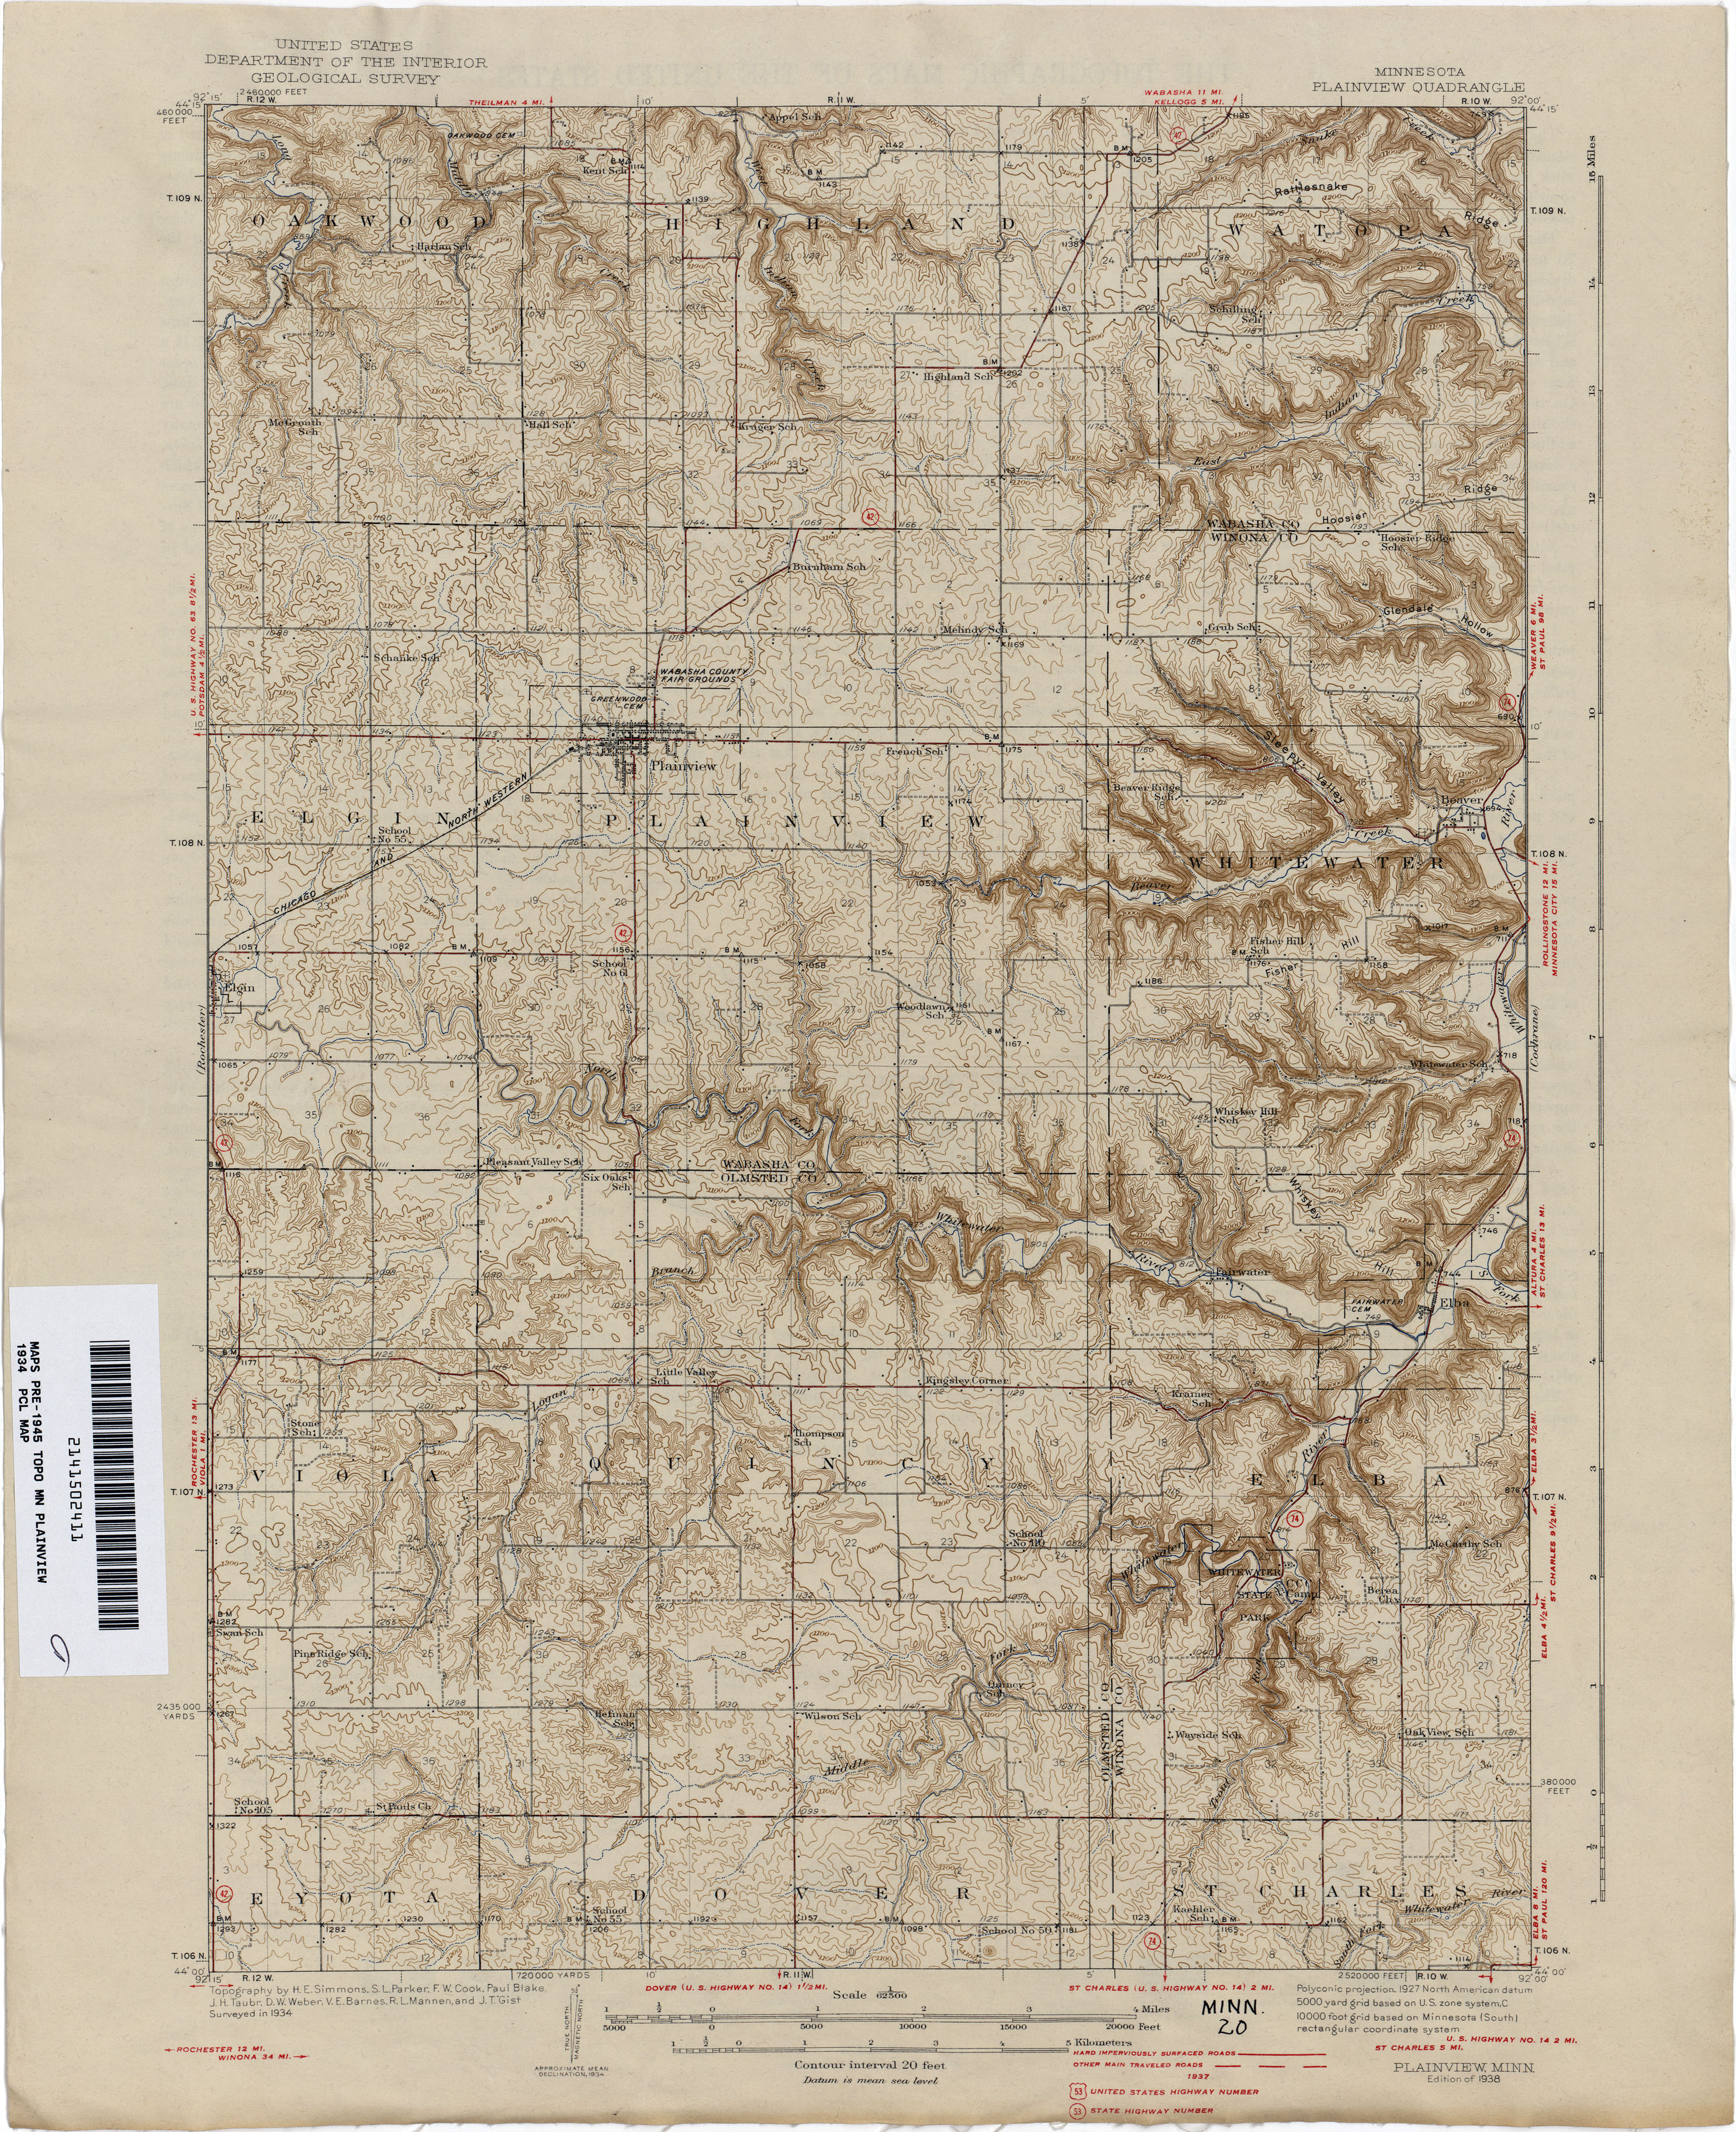 U Of Minnesota Map.Minnesota Historical Topographic Maps Perry Castaneda Map